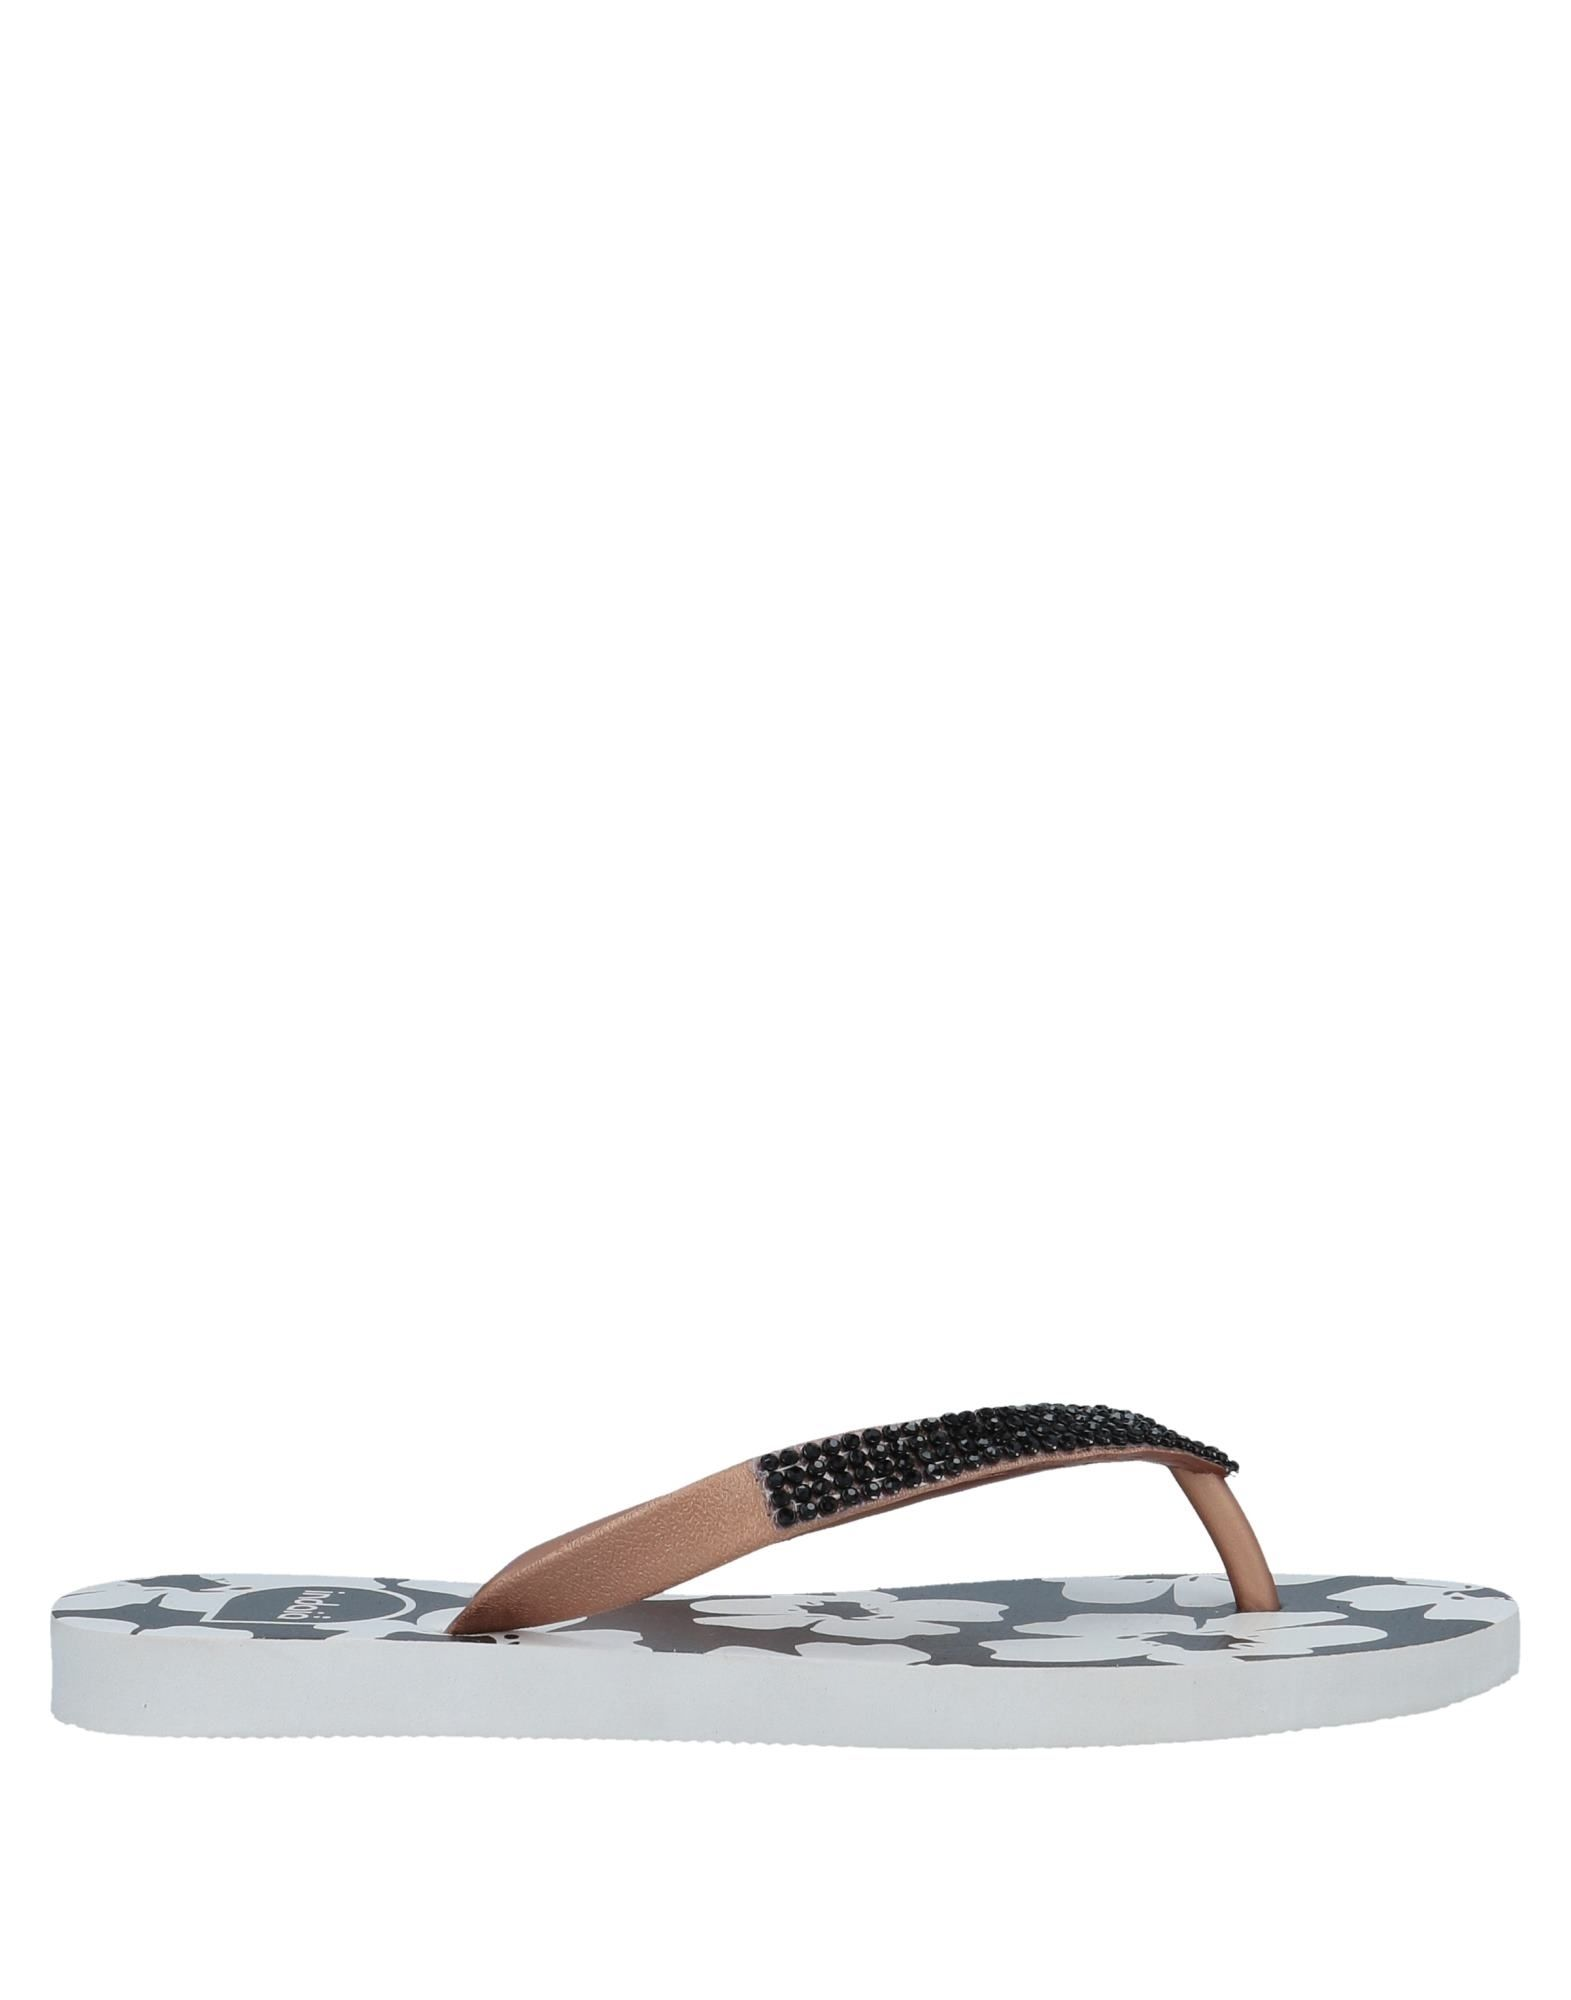 Indaia Dianetten Damen  11546374QX Gute Qualität beliebte Schuhe